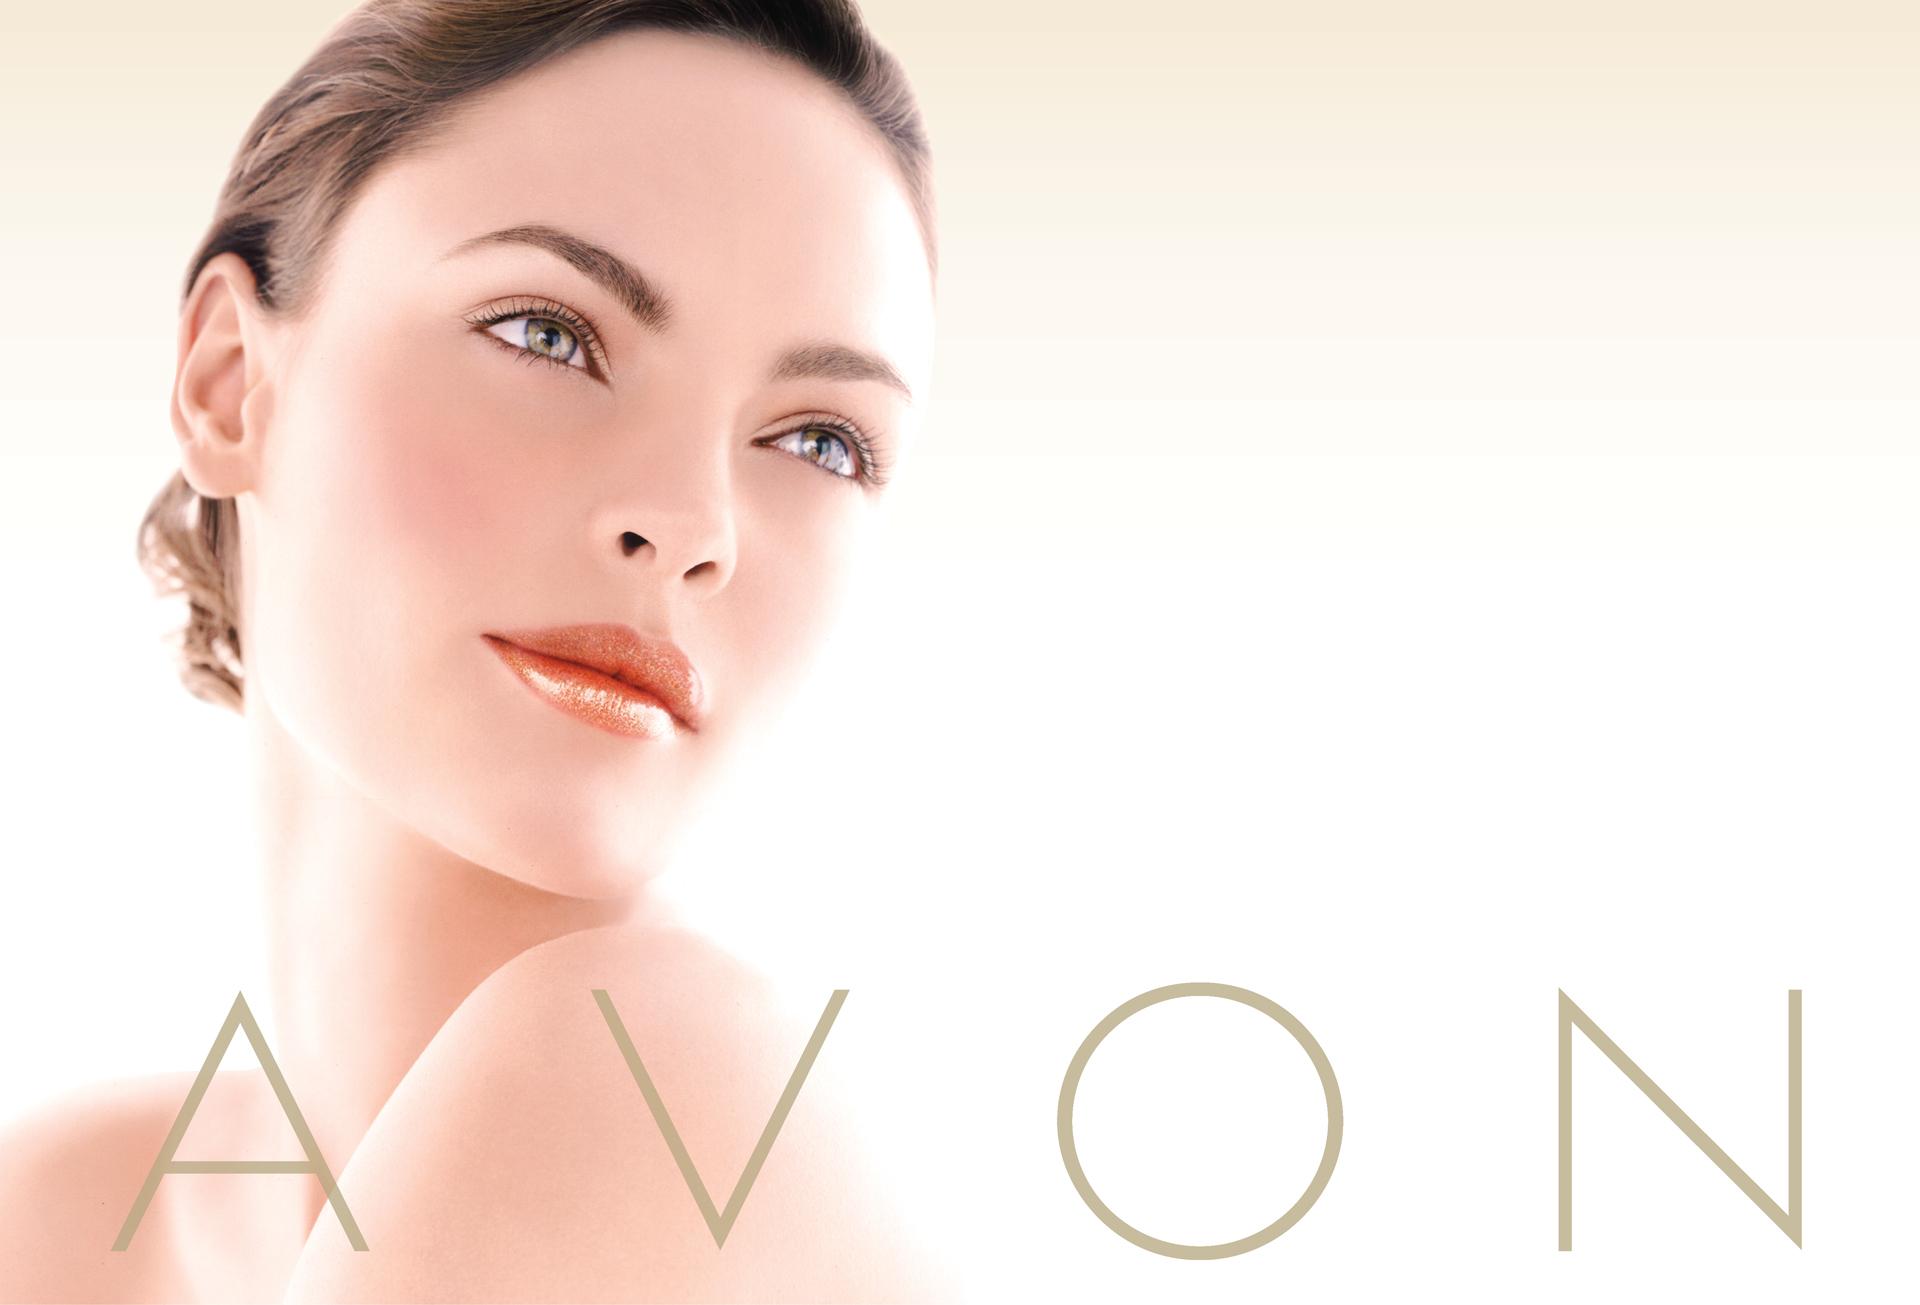 avon-new-brand-cc.jpg